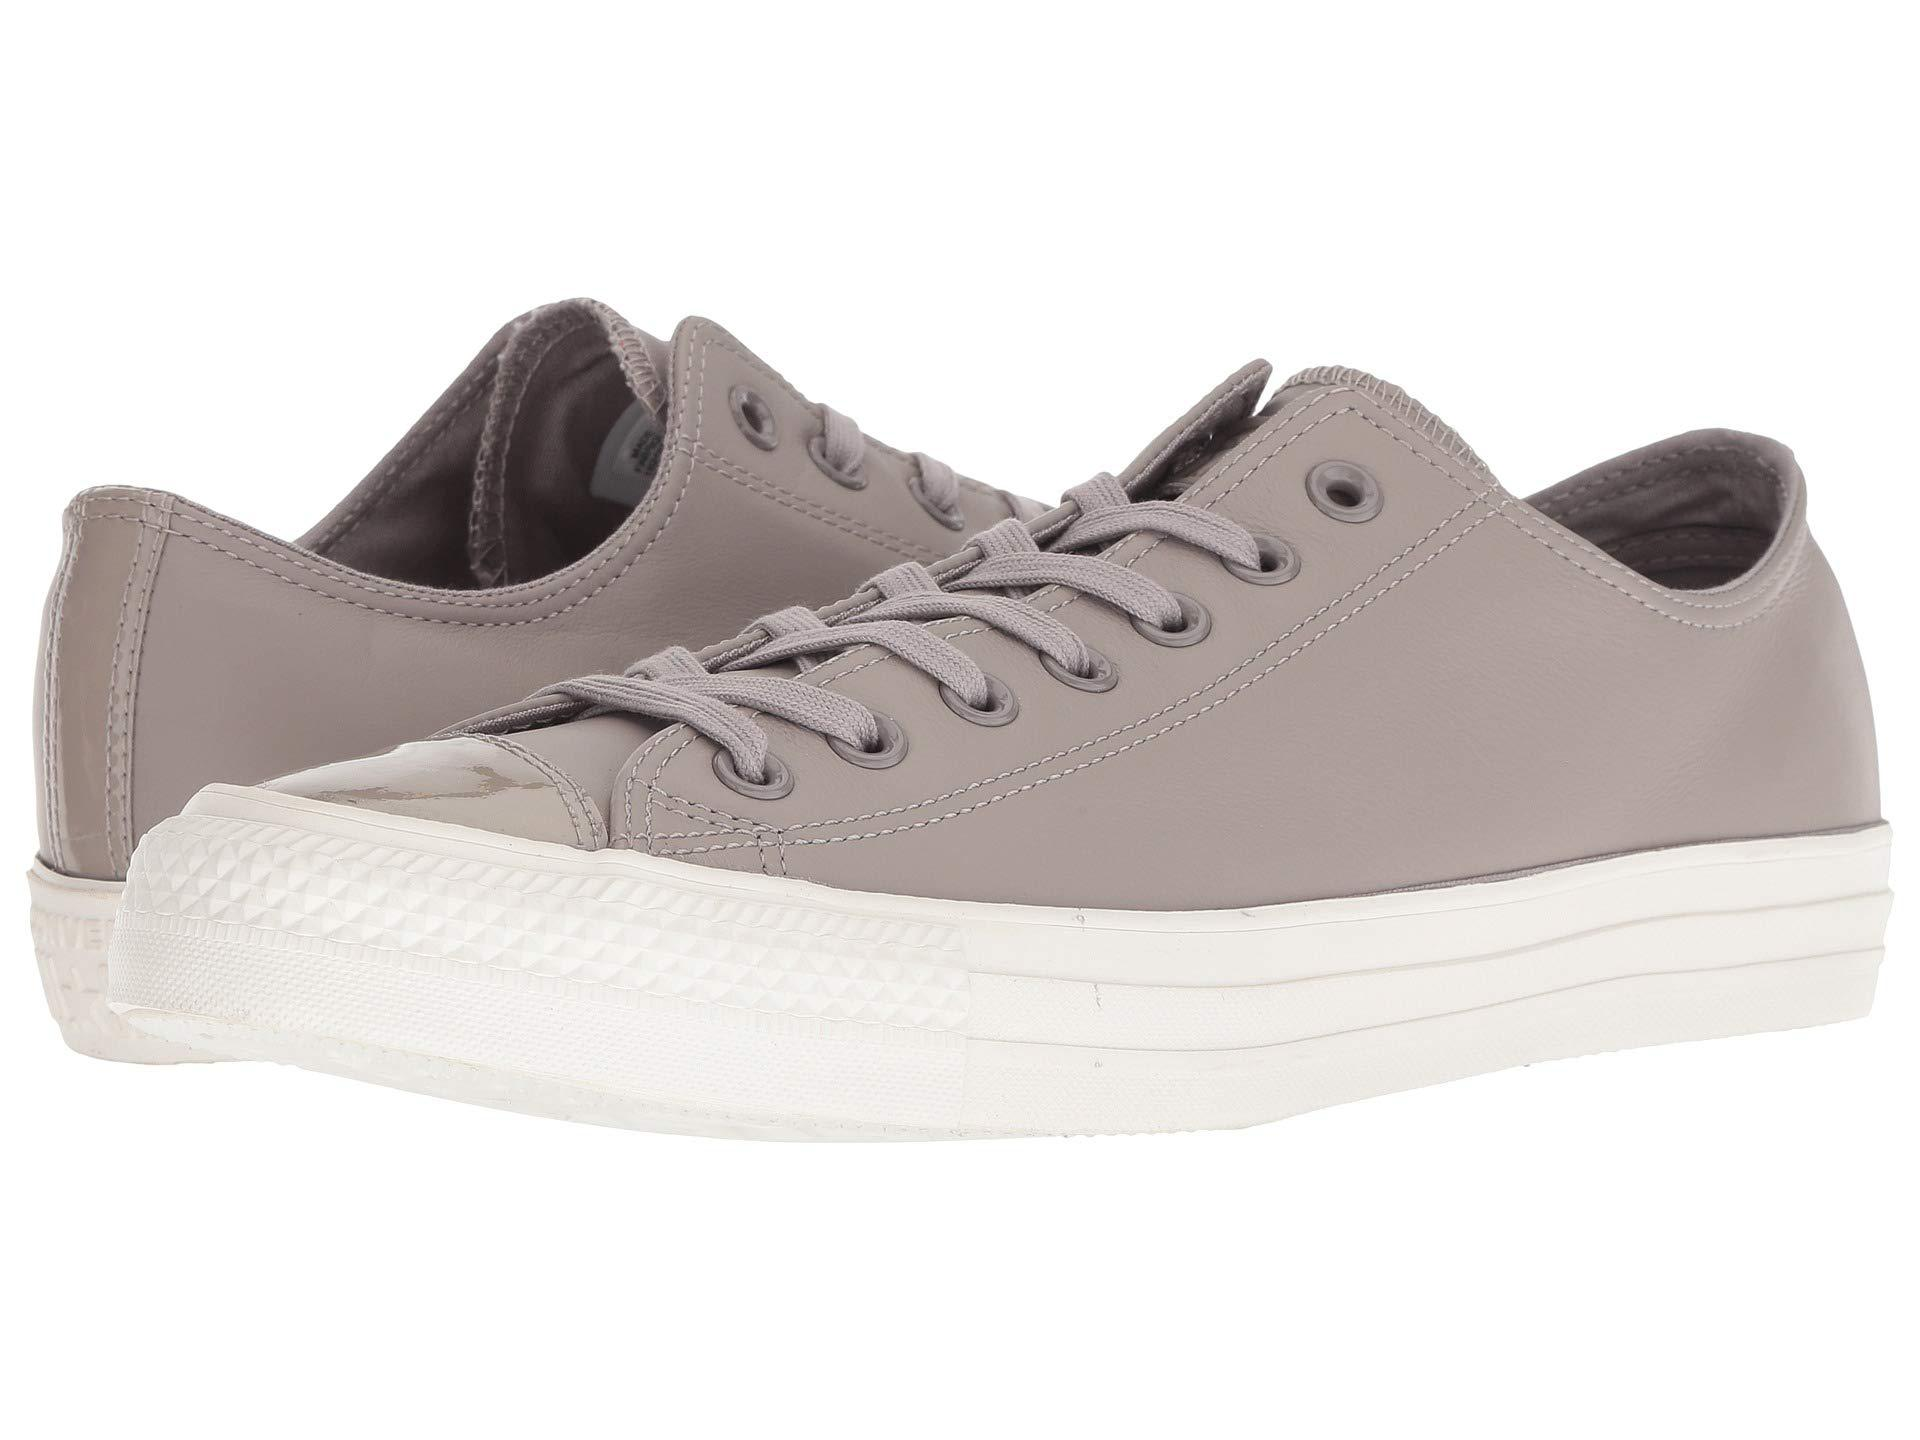 6fbd14d93c00e3 Lyst - Converse Chuck Taylor All Star Leather - Ox (mercury Grey ...